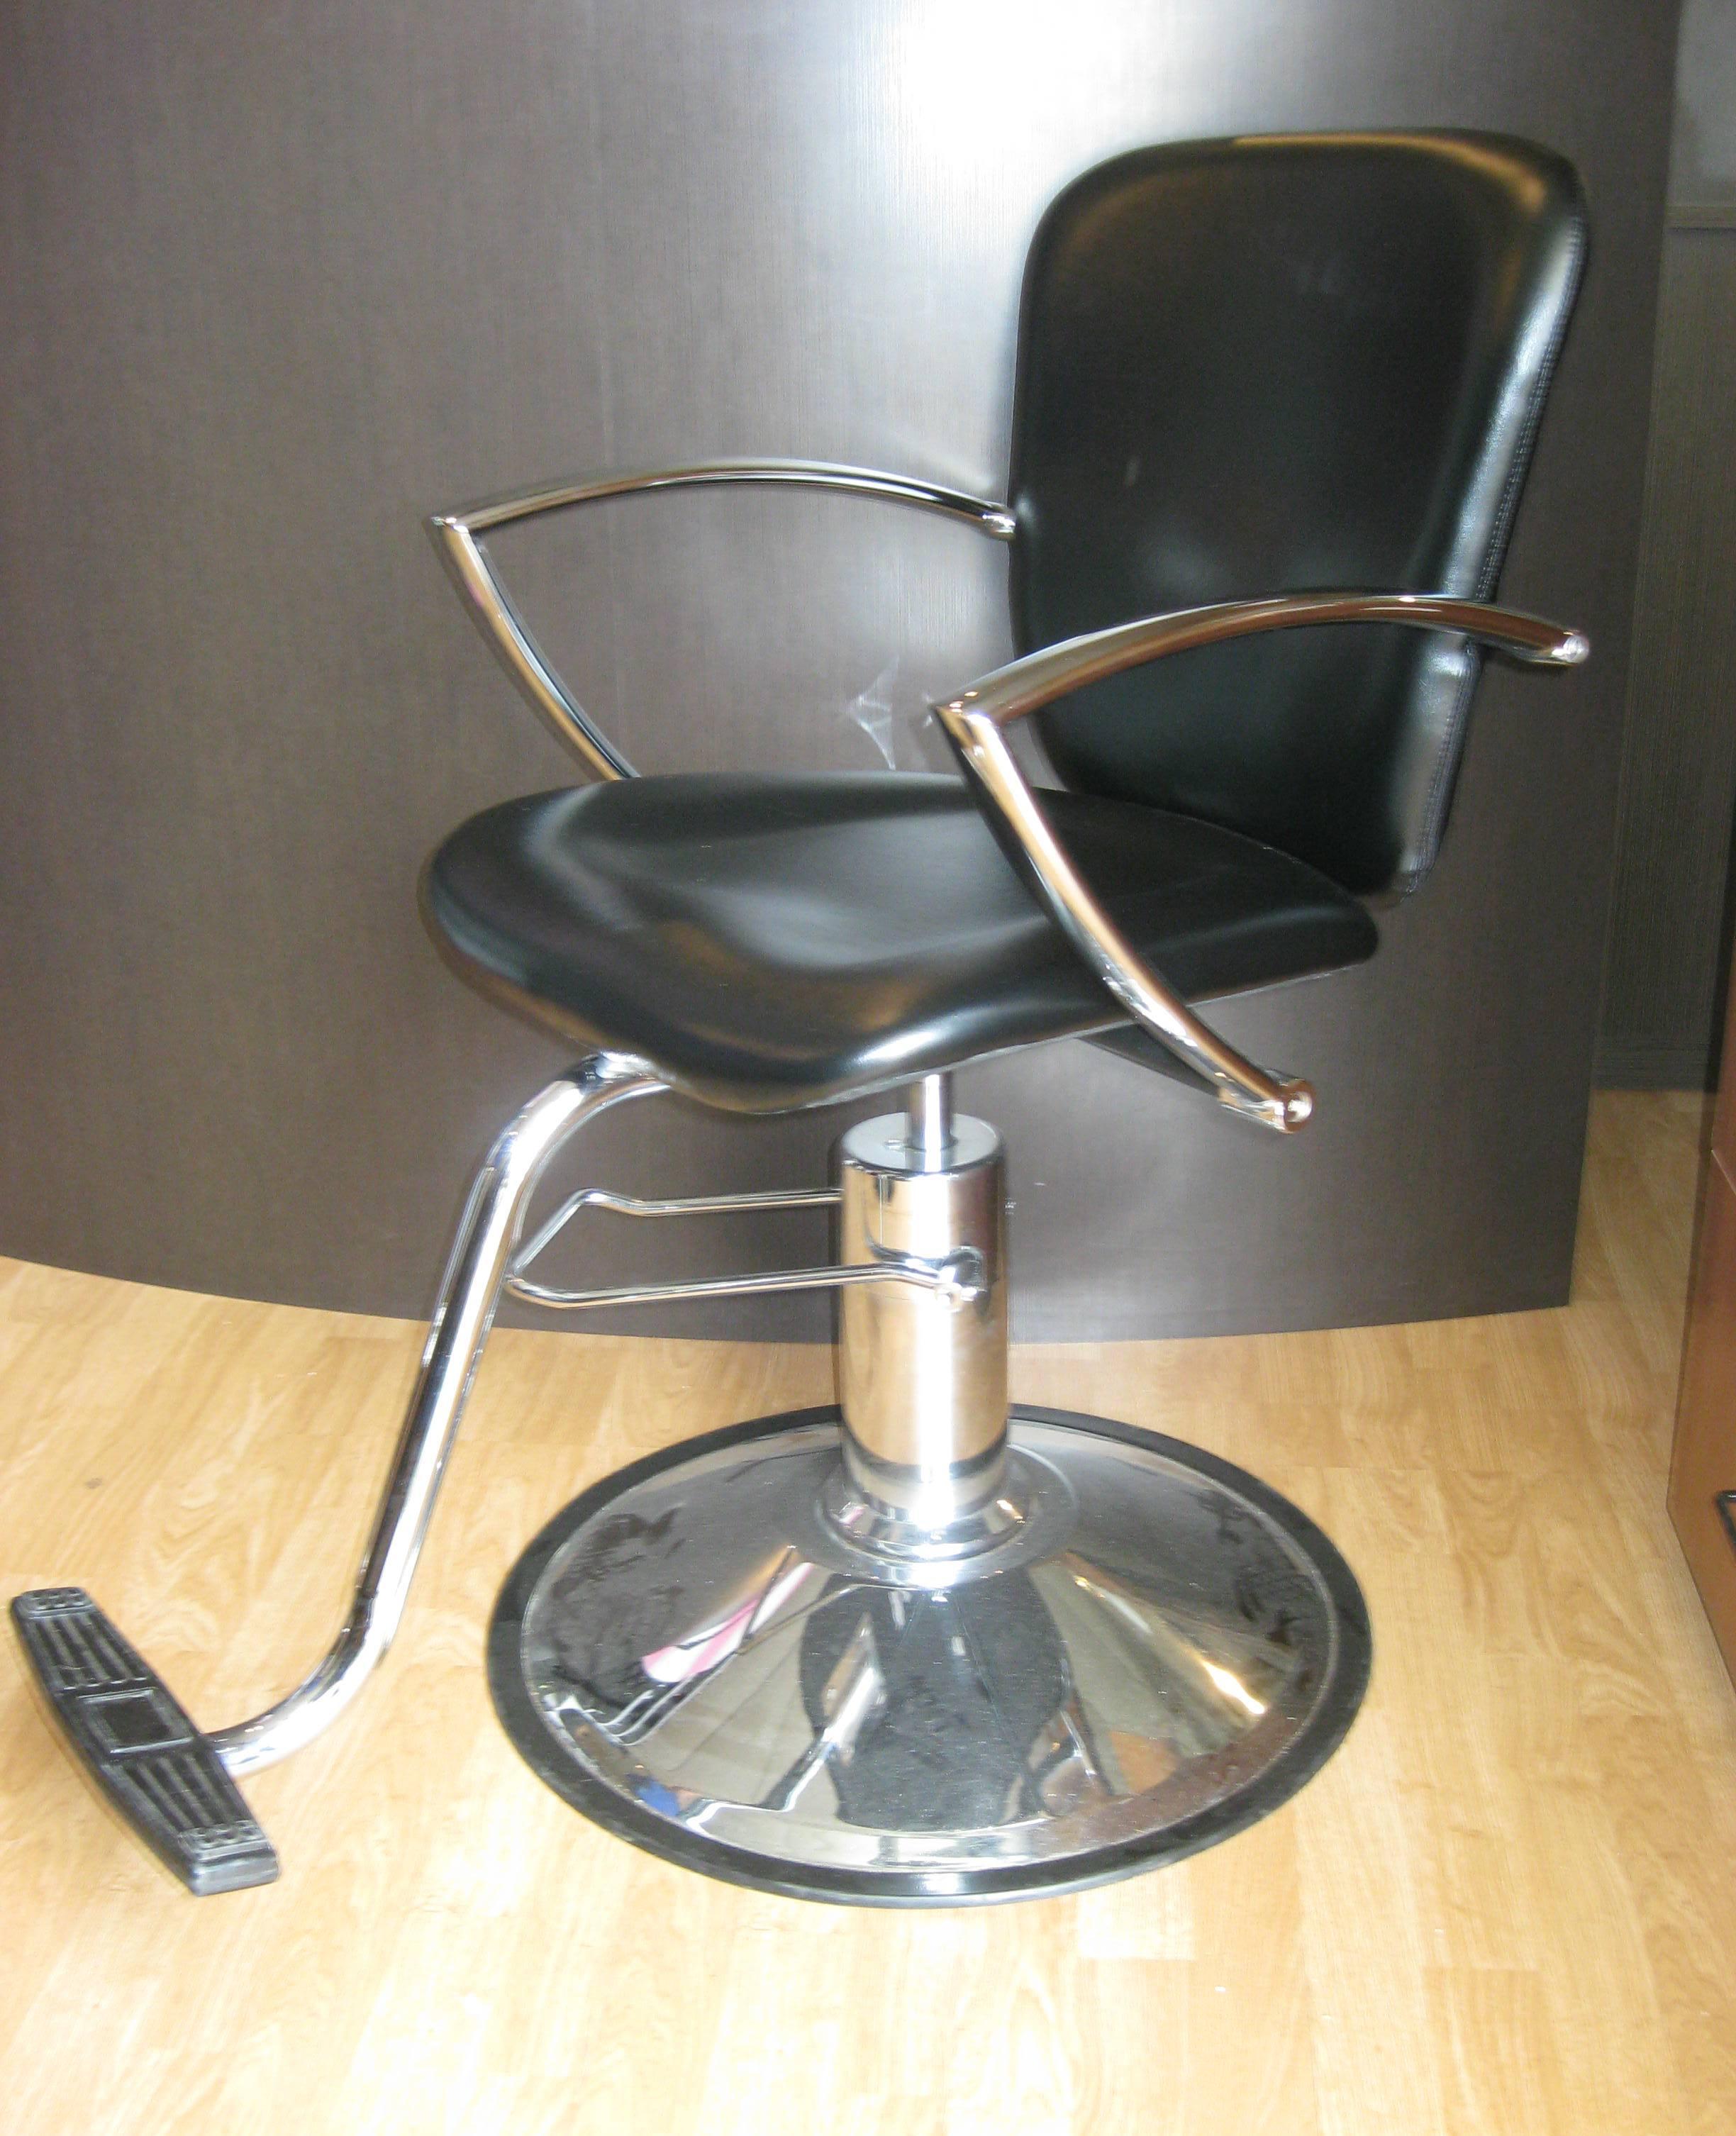 Salon equipment furniture for Stylist equipment